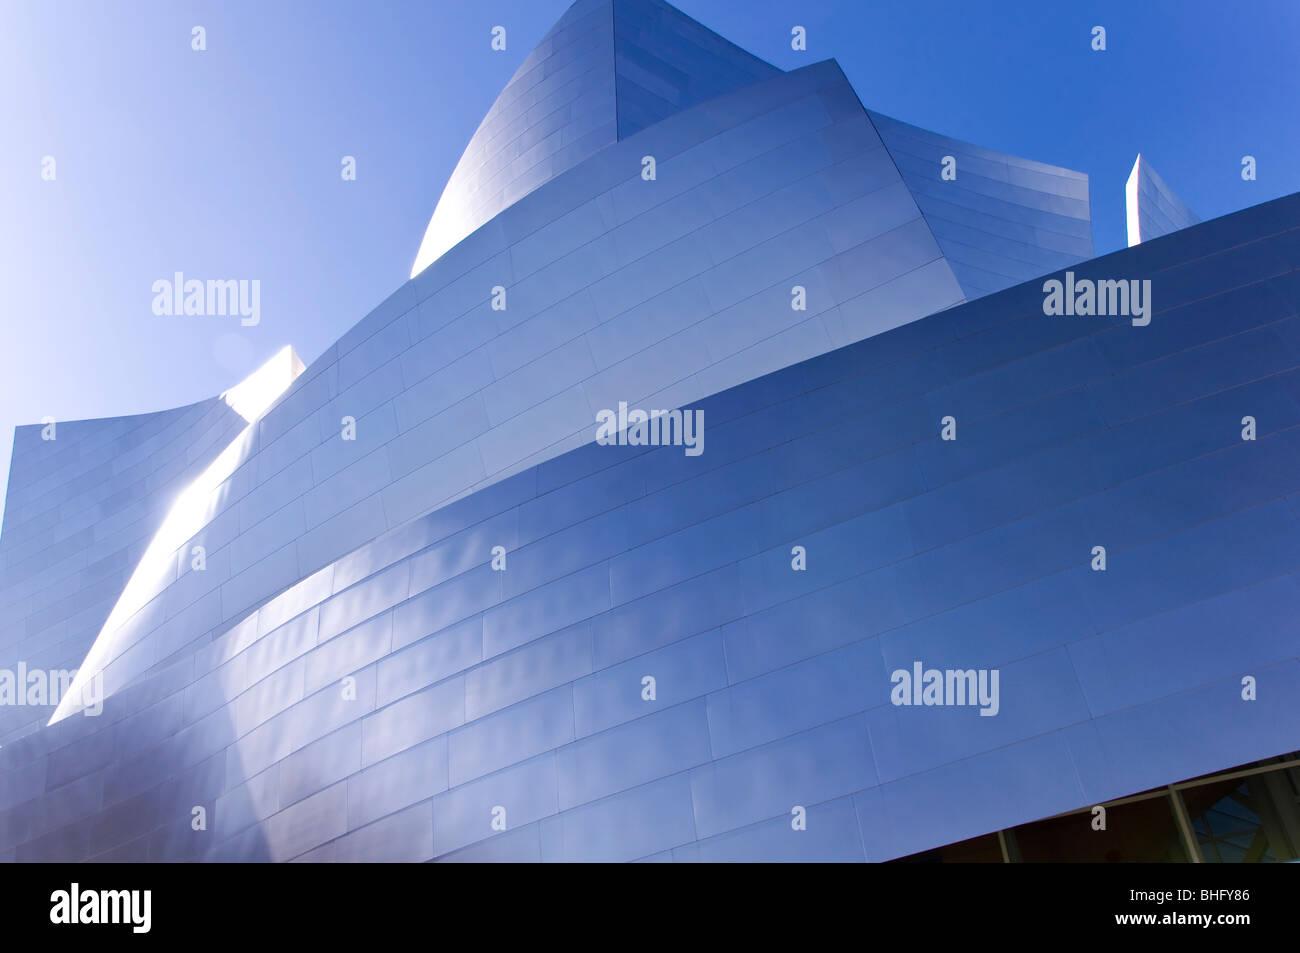 The Walt Disney Concert Hall in Los Angeles, California, USA - Stock Image